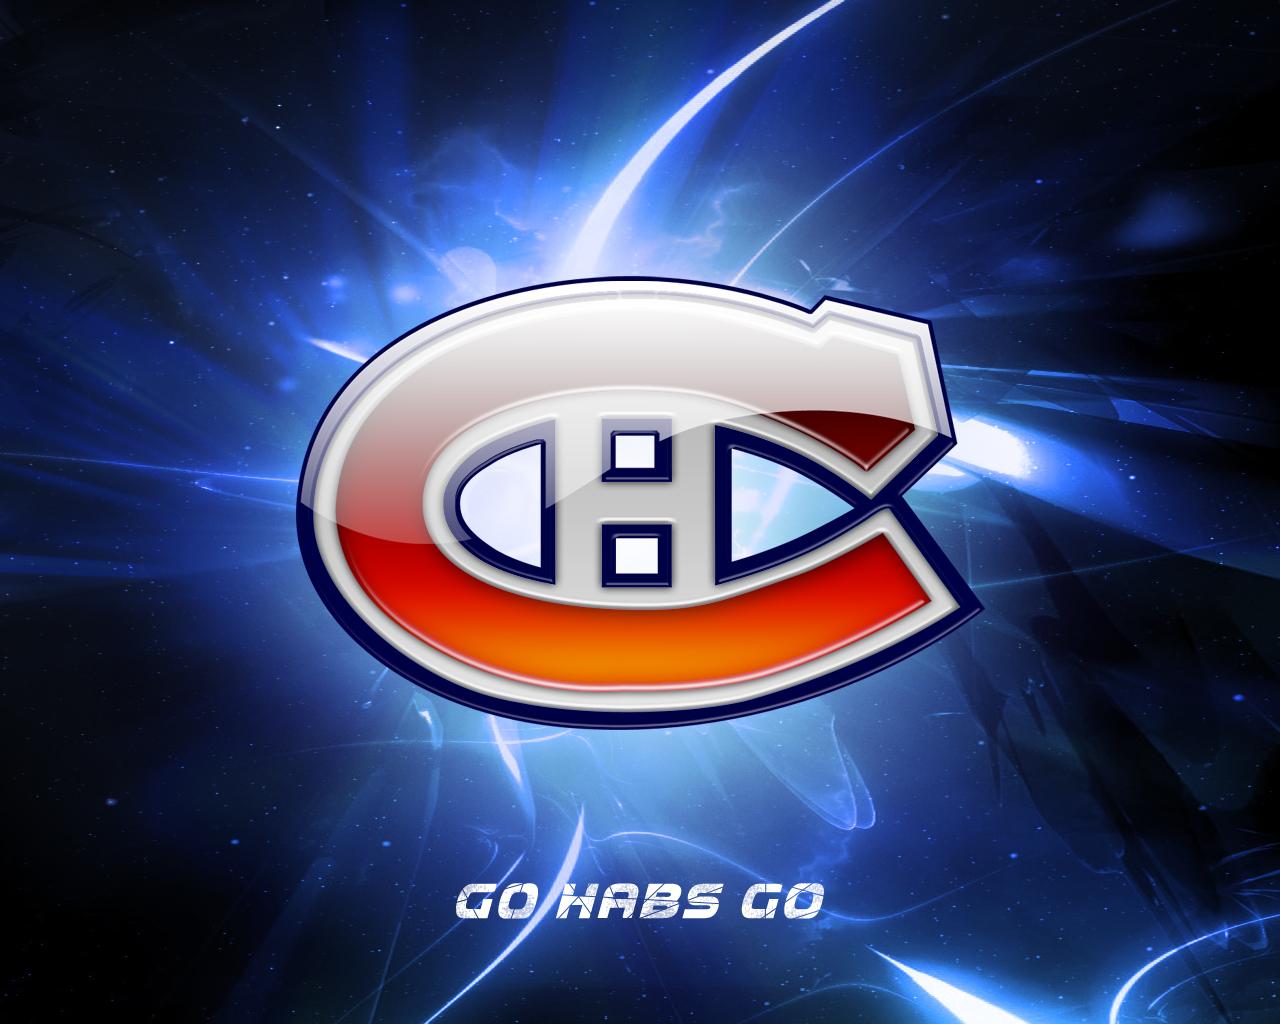 Montreal Canadiens Wallpaper Habs Go Go 1280x1024